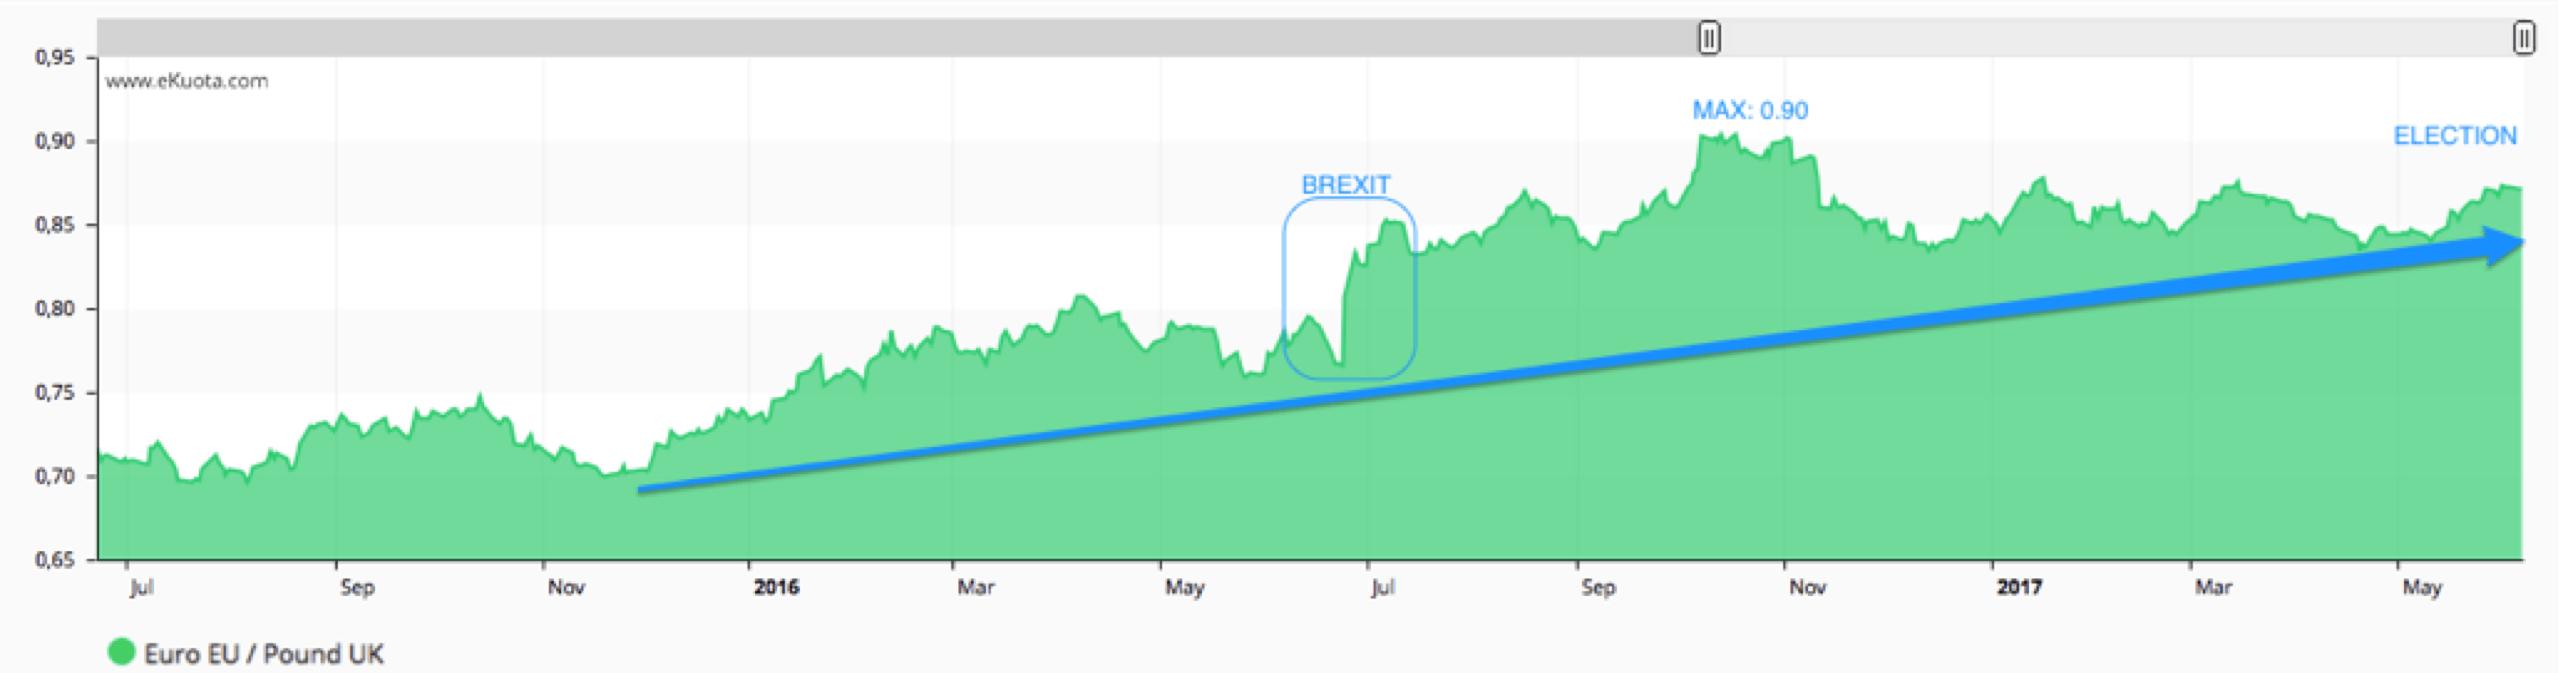 Euro GBP FX - ekuota.com